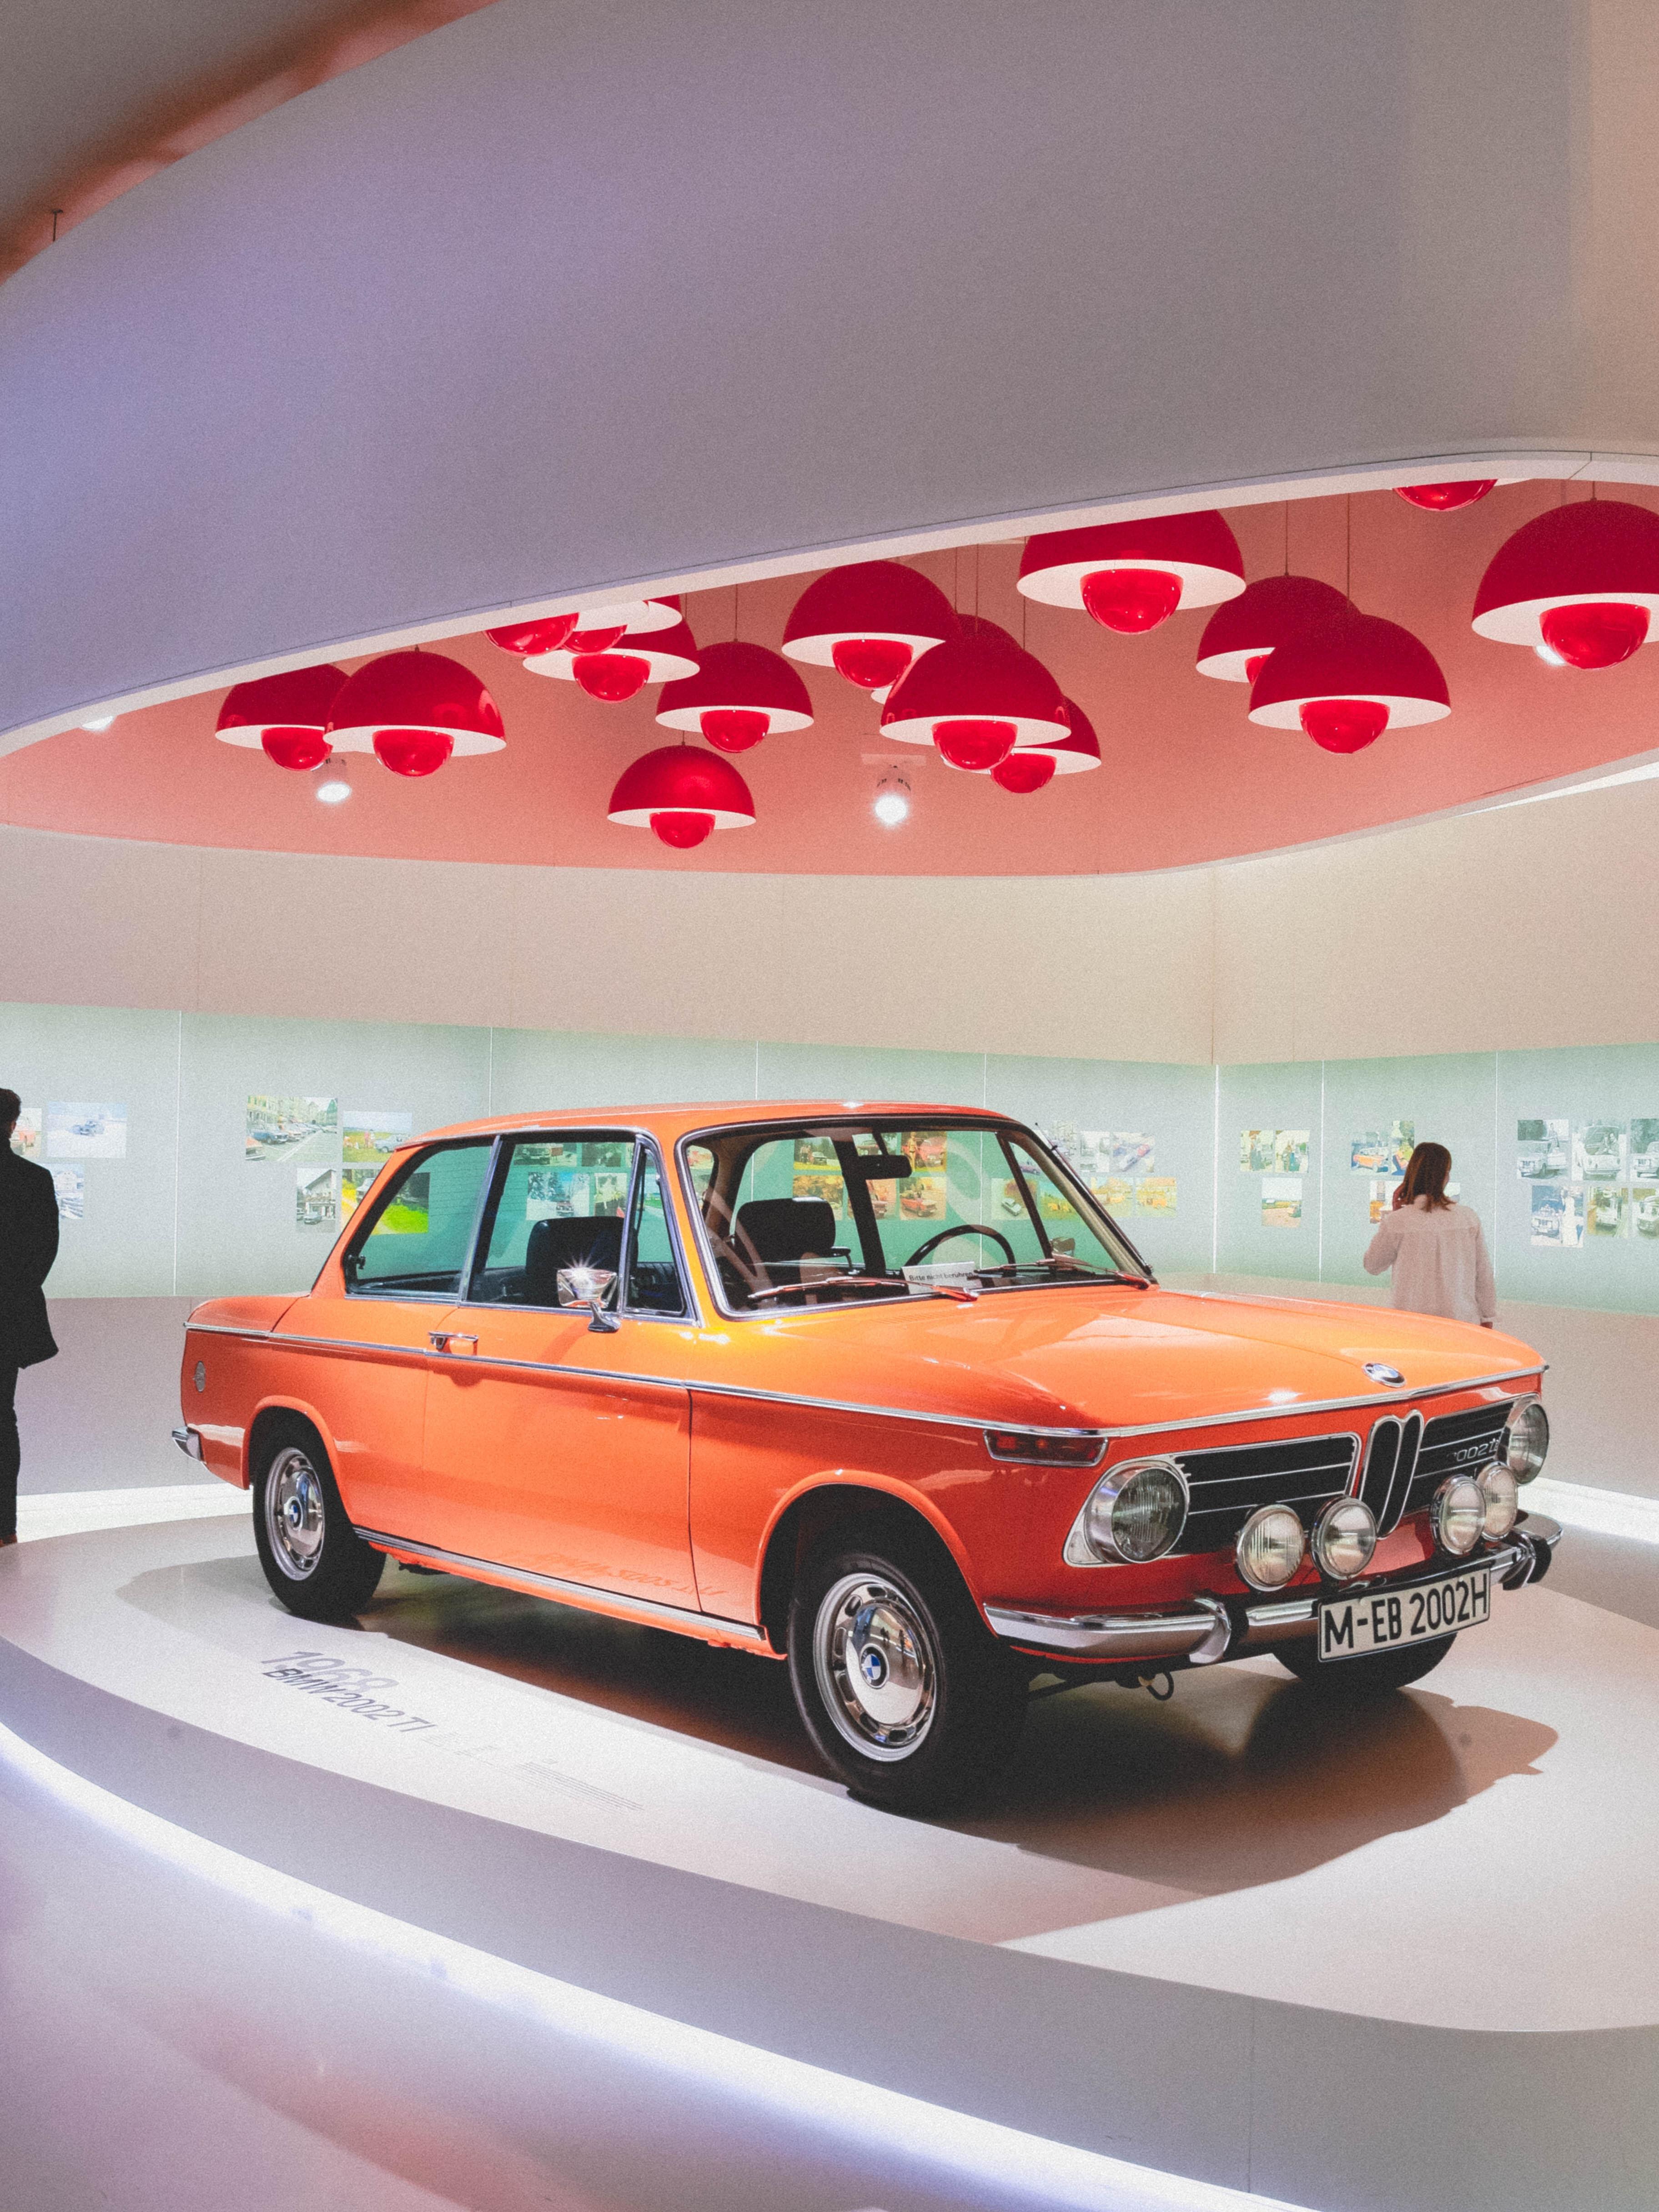 orange coupe on display area